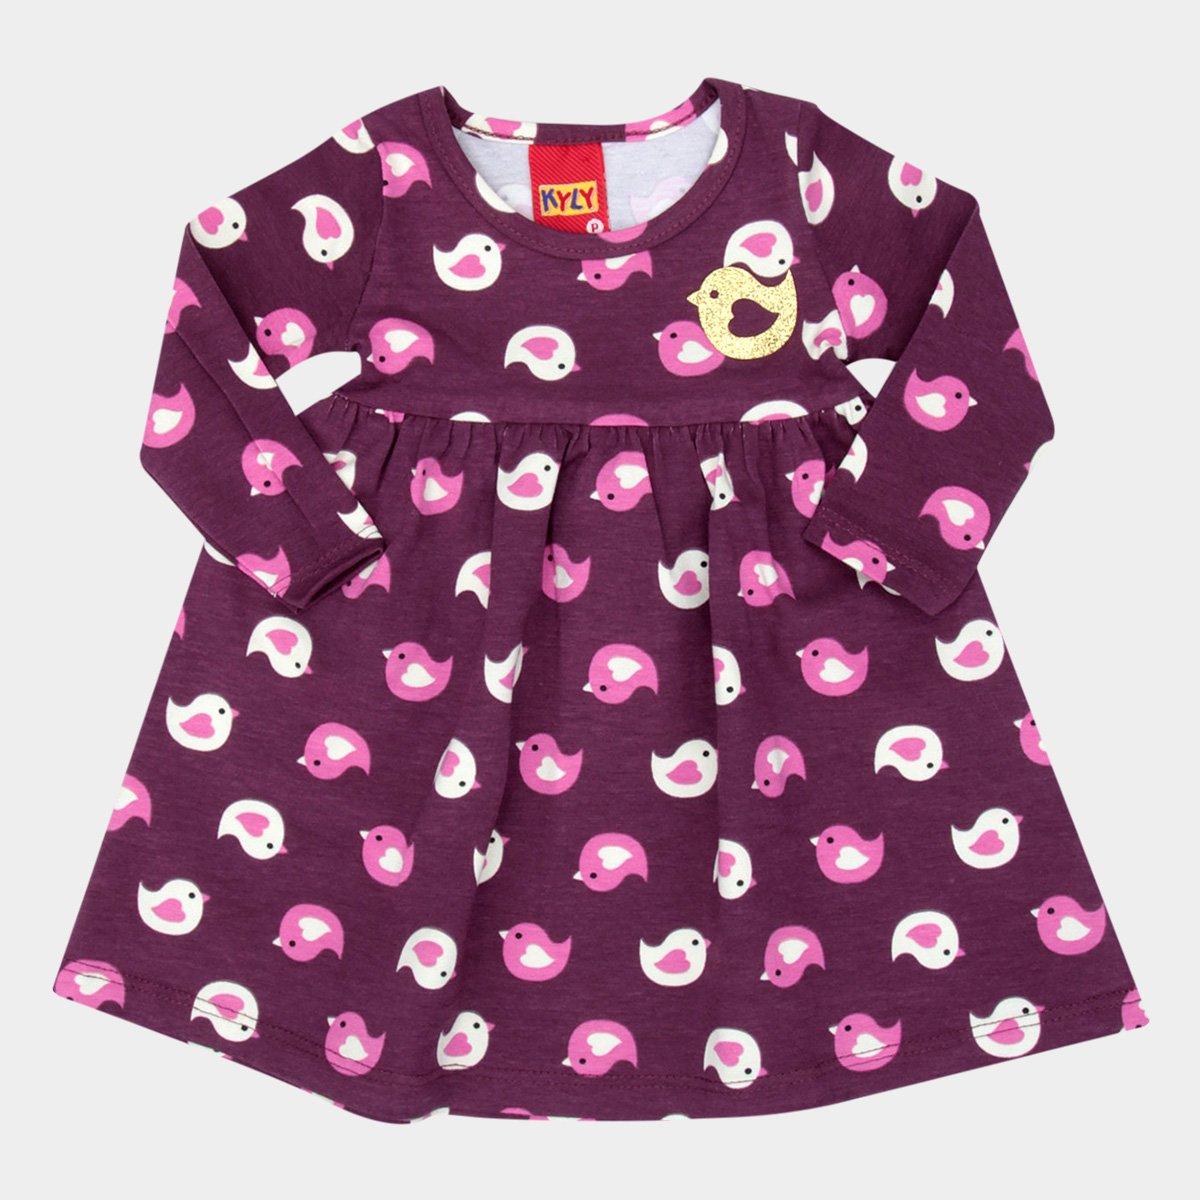 7c1eb38375 Vestido Infantil Kyly Estampado Pássaros Manga Longa Feminino